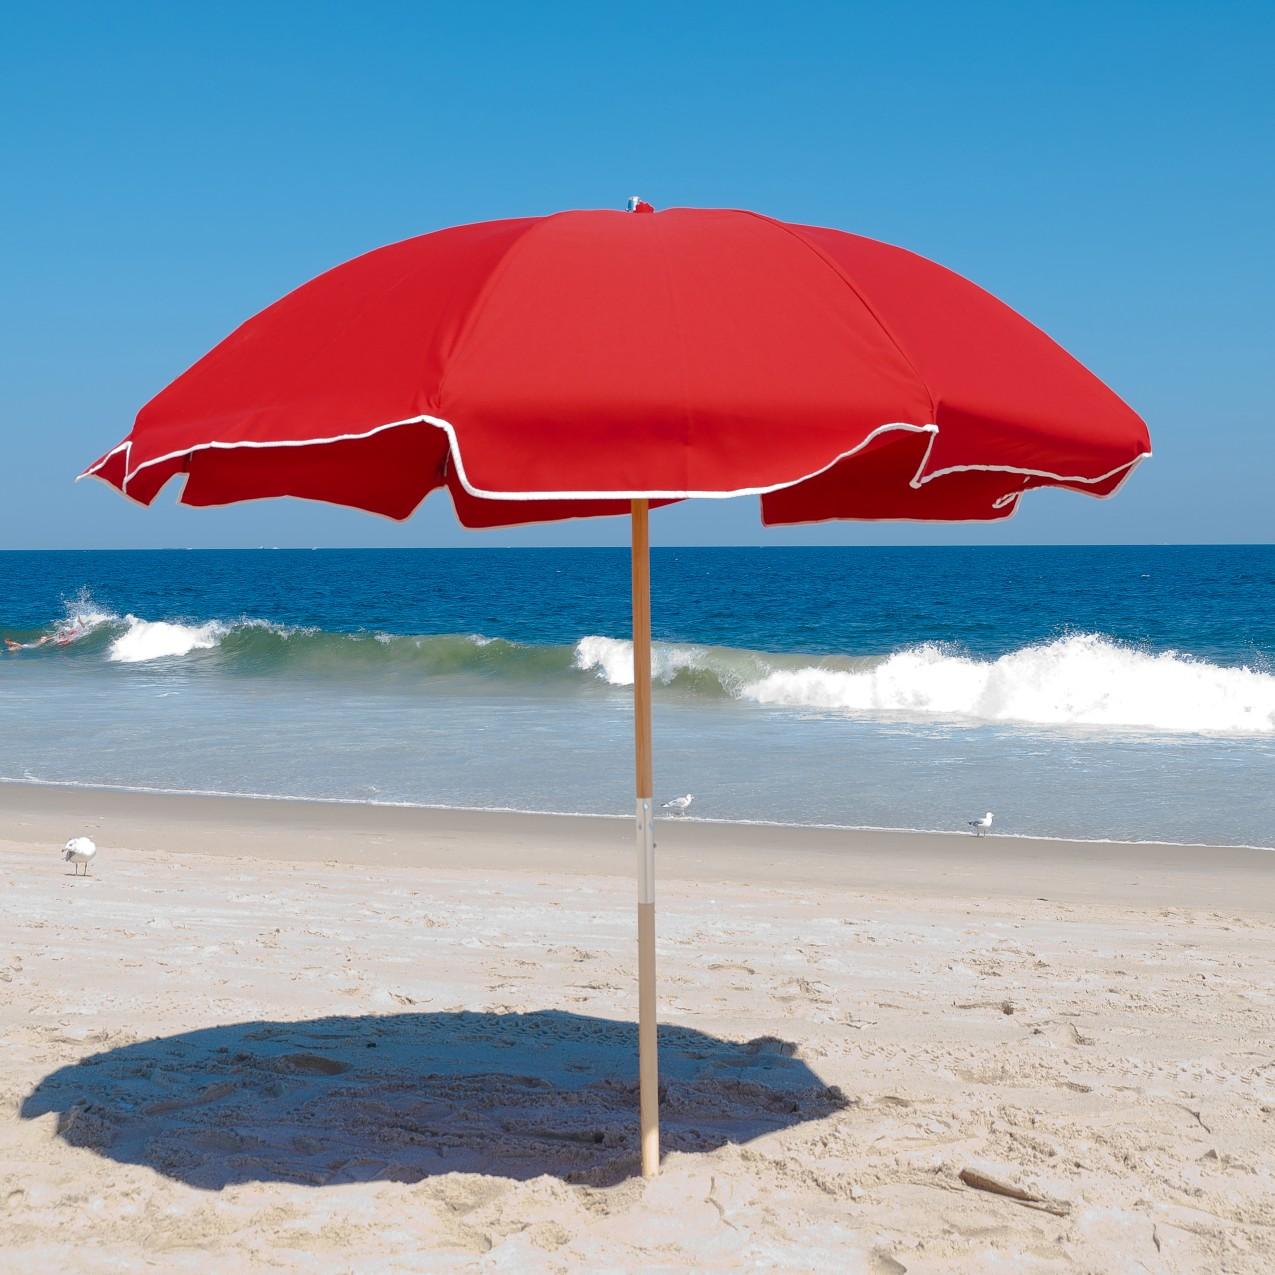 beach-umbrella-red-pixlr.jpg